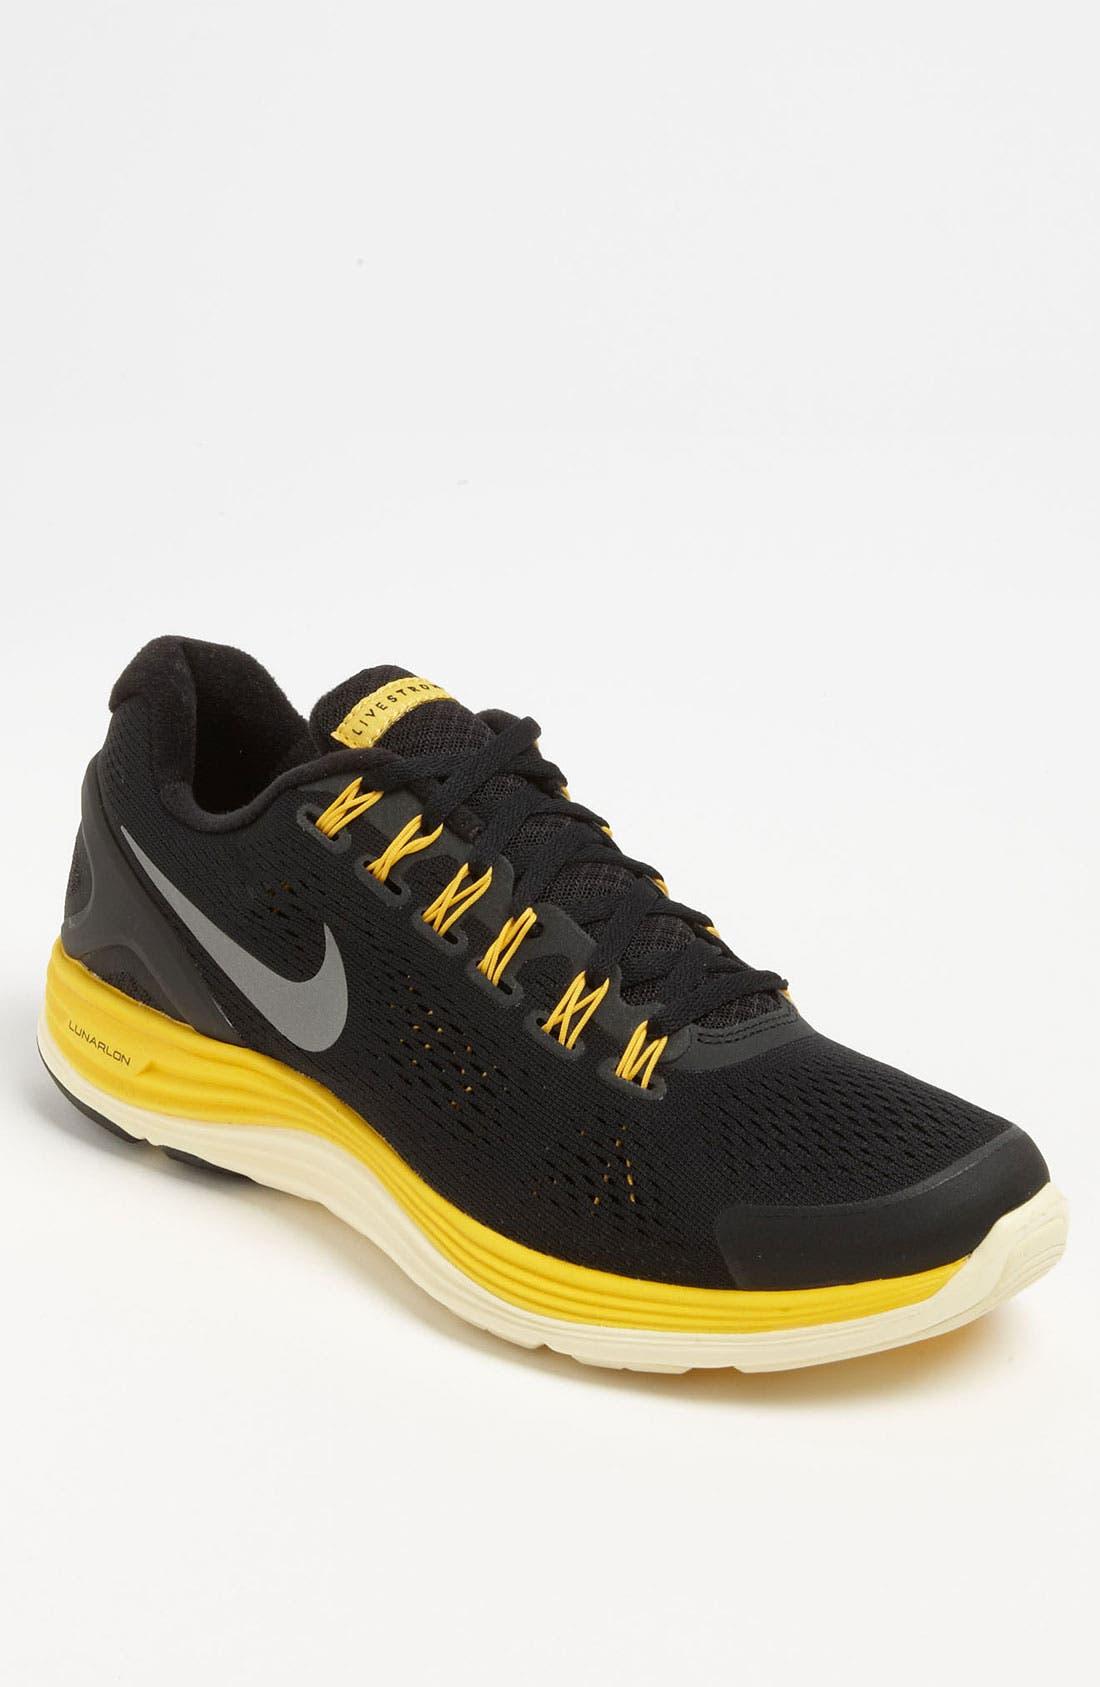 Main Image - Nike 'LIVESTRONG LunarGlide+ 4' Running Shoe (Men)